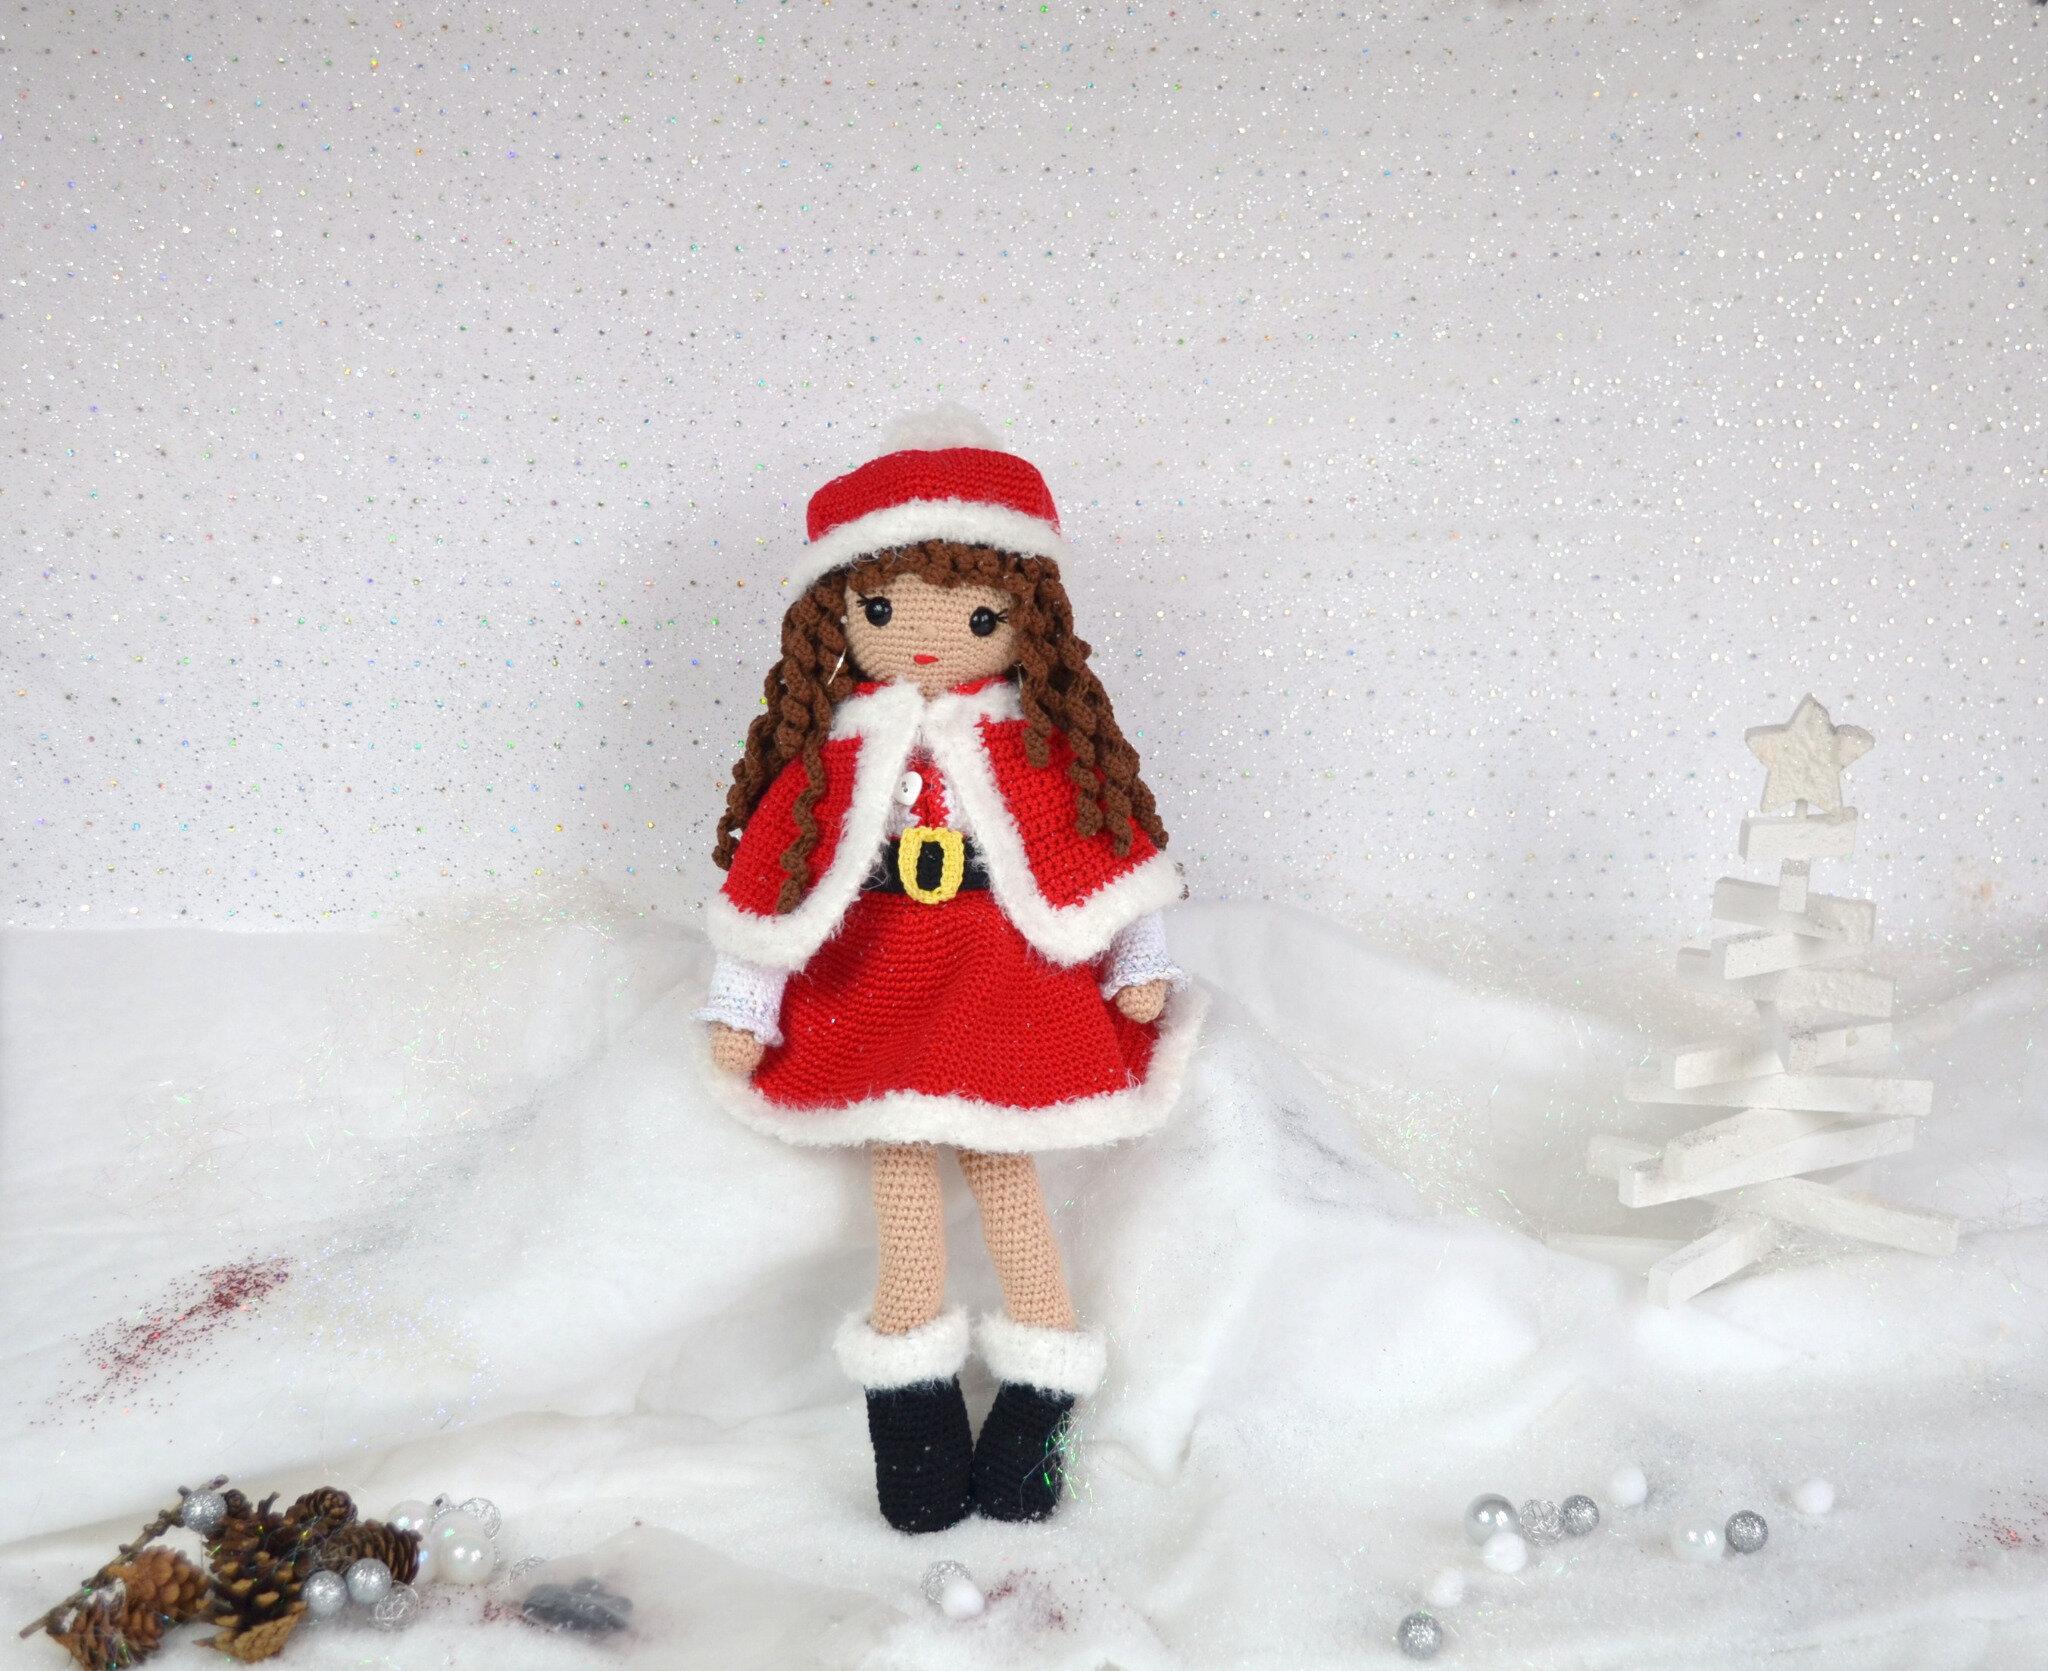 Clem féérie de Noël-La chouette bricole-tuto Alice Balice DIY-crochet (19)